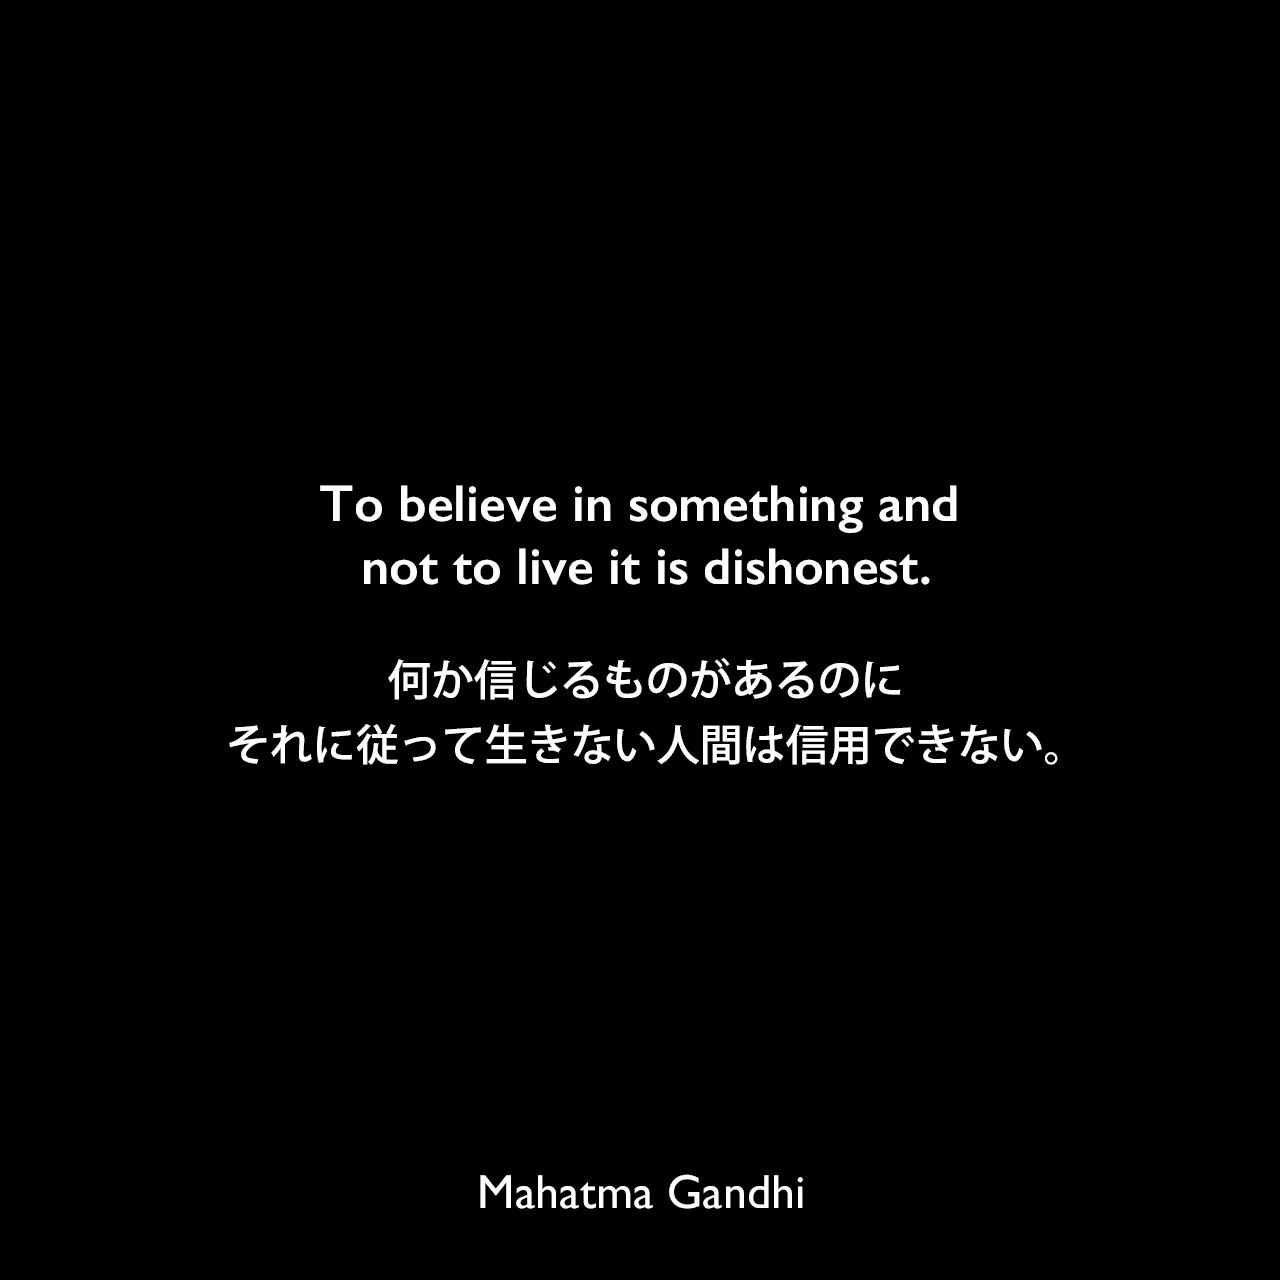 To believe in something and not to live it is dishonest.何か信じるものがあるのに、それに従って生きない人間は信用できない。Mahatma Gandhi